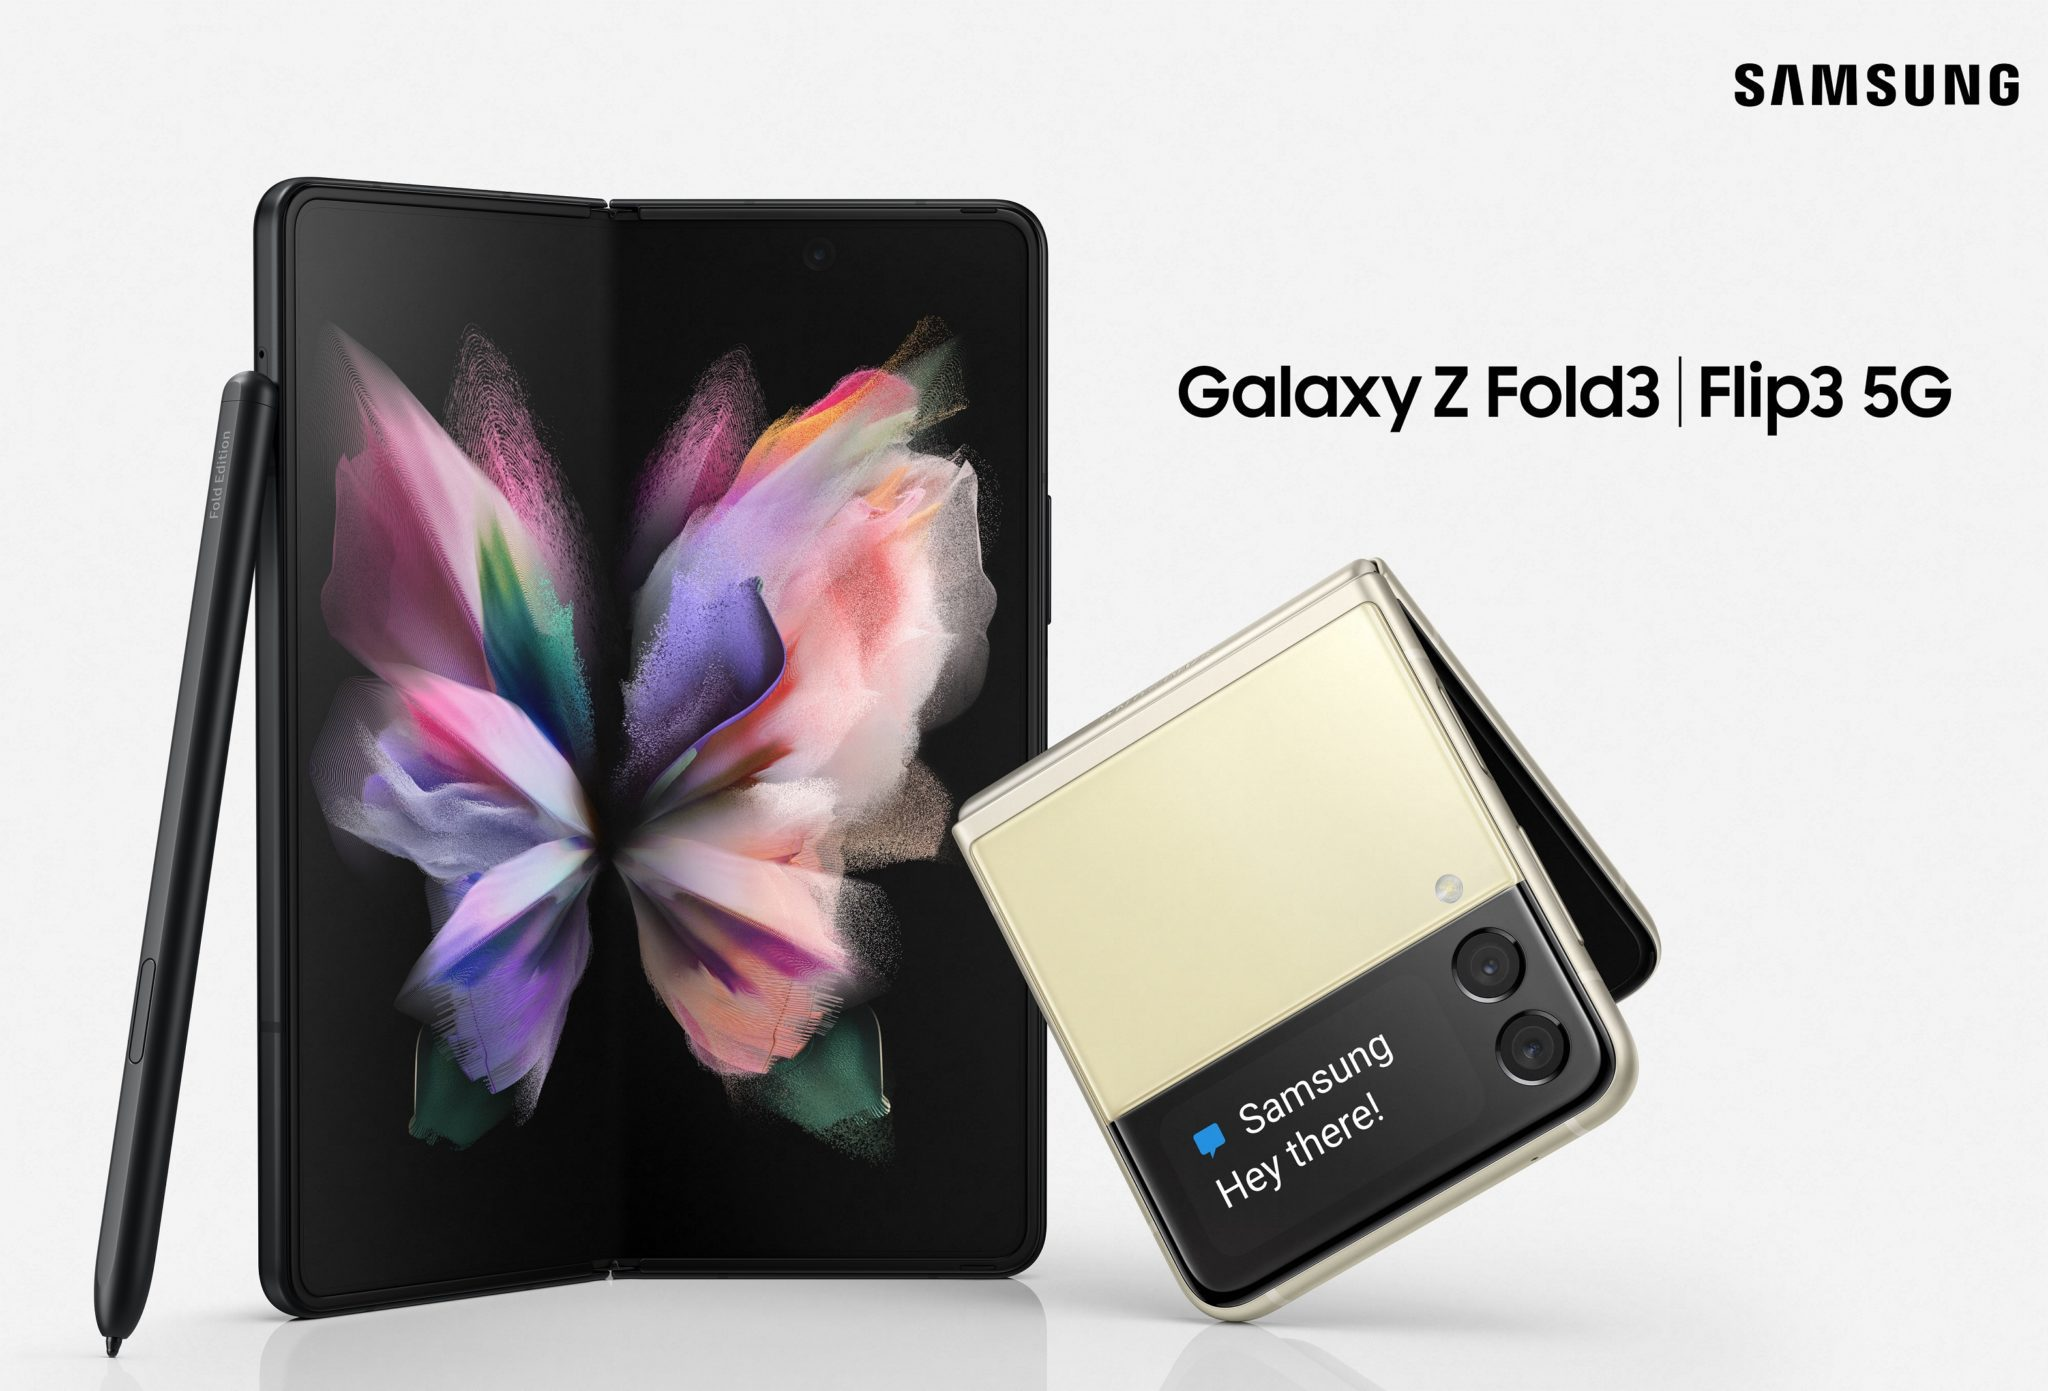 Samsung Galaxy Z Fold3, Z Flip3 5G